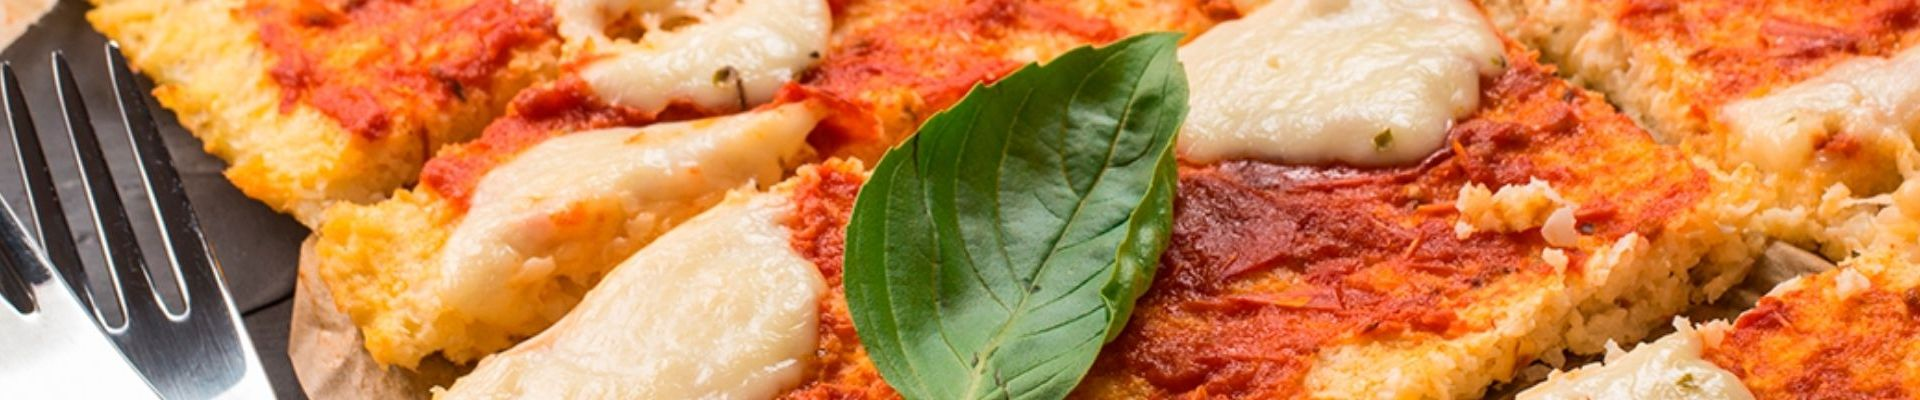 Los mejores restaurantes de pizza a domicilio en Lavapies